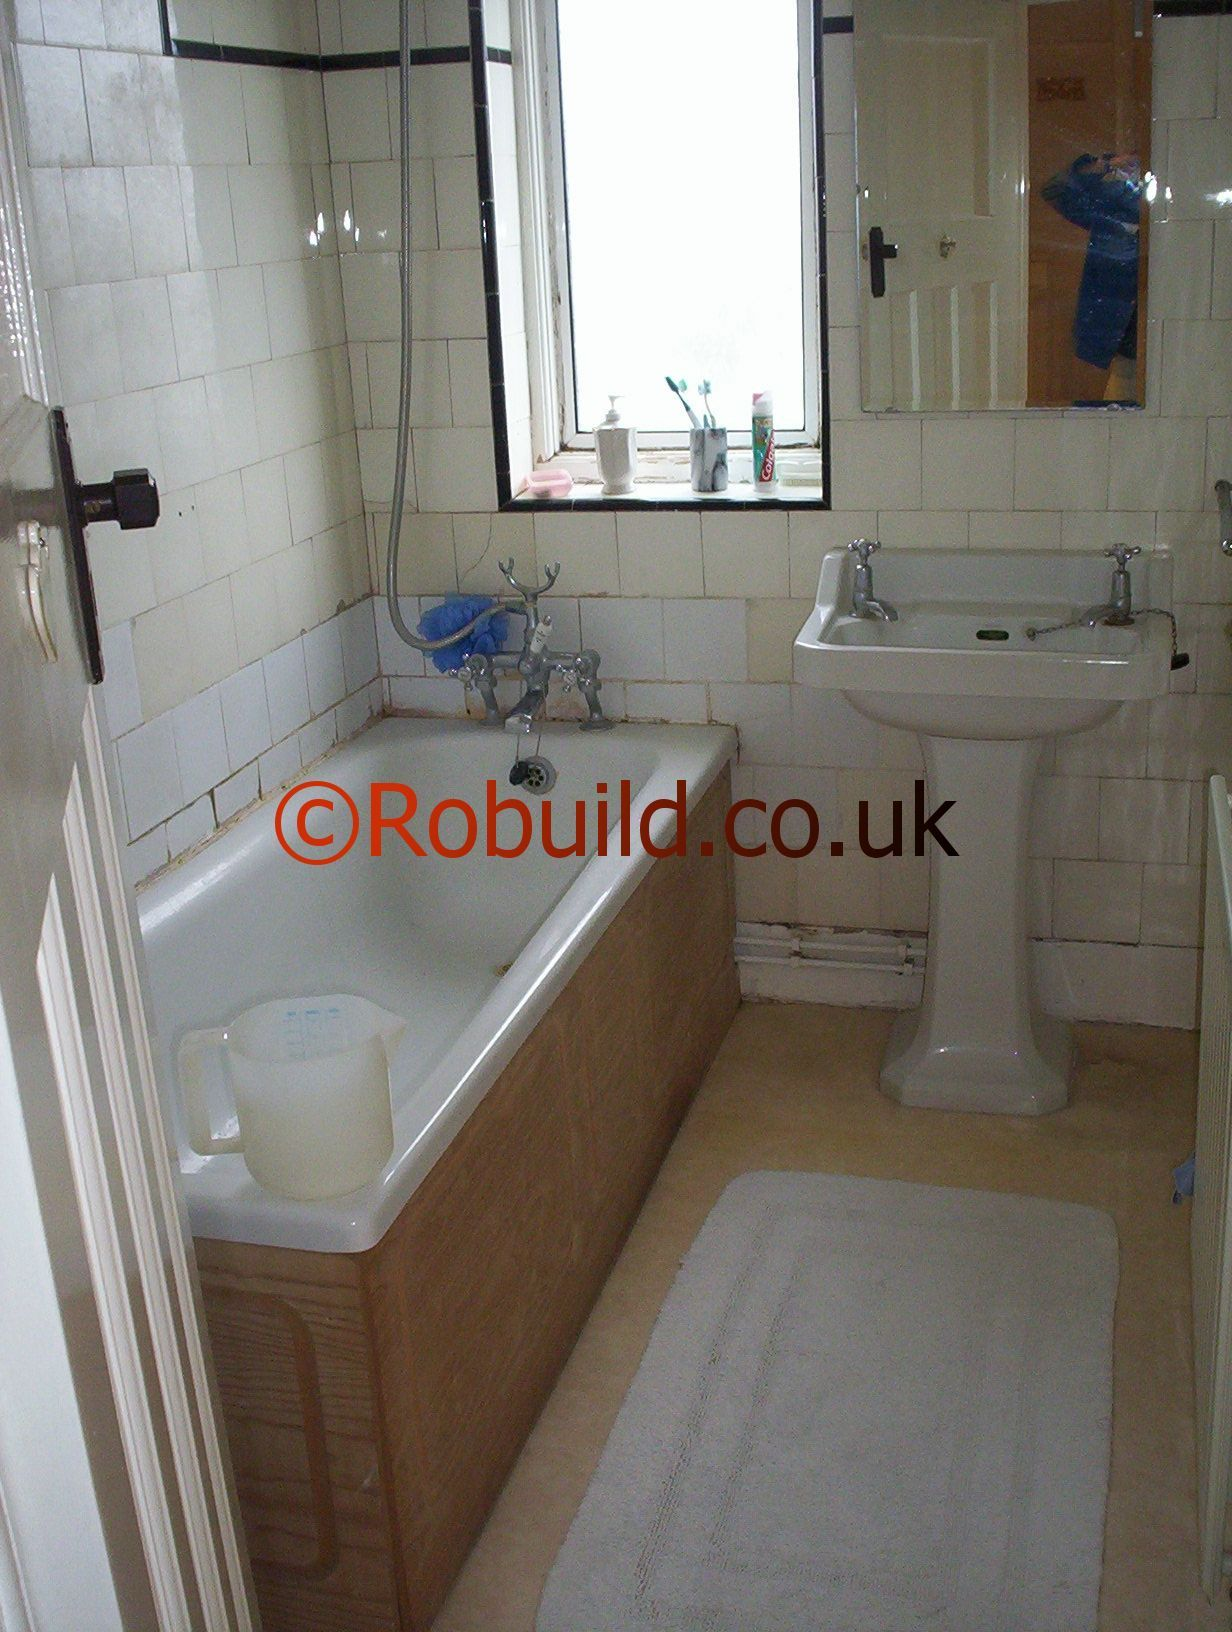 bathroom ideas for small bathrooms uk on Small Bathroom Ideas Uk id=51822